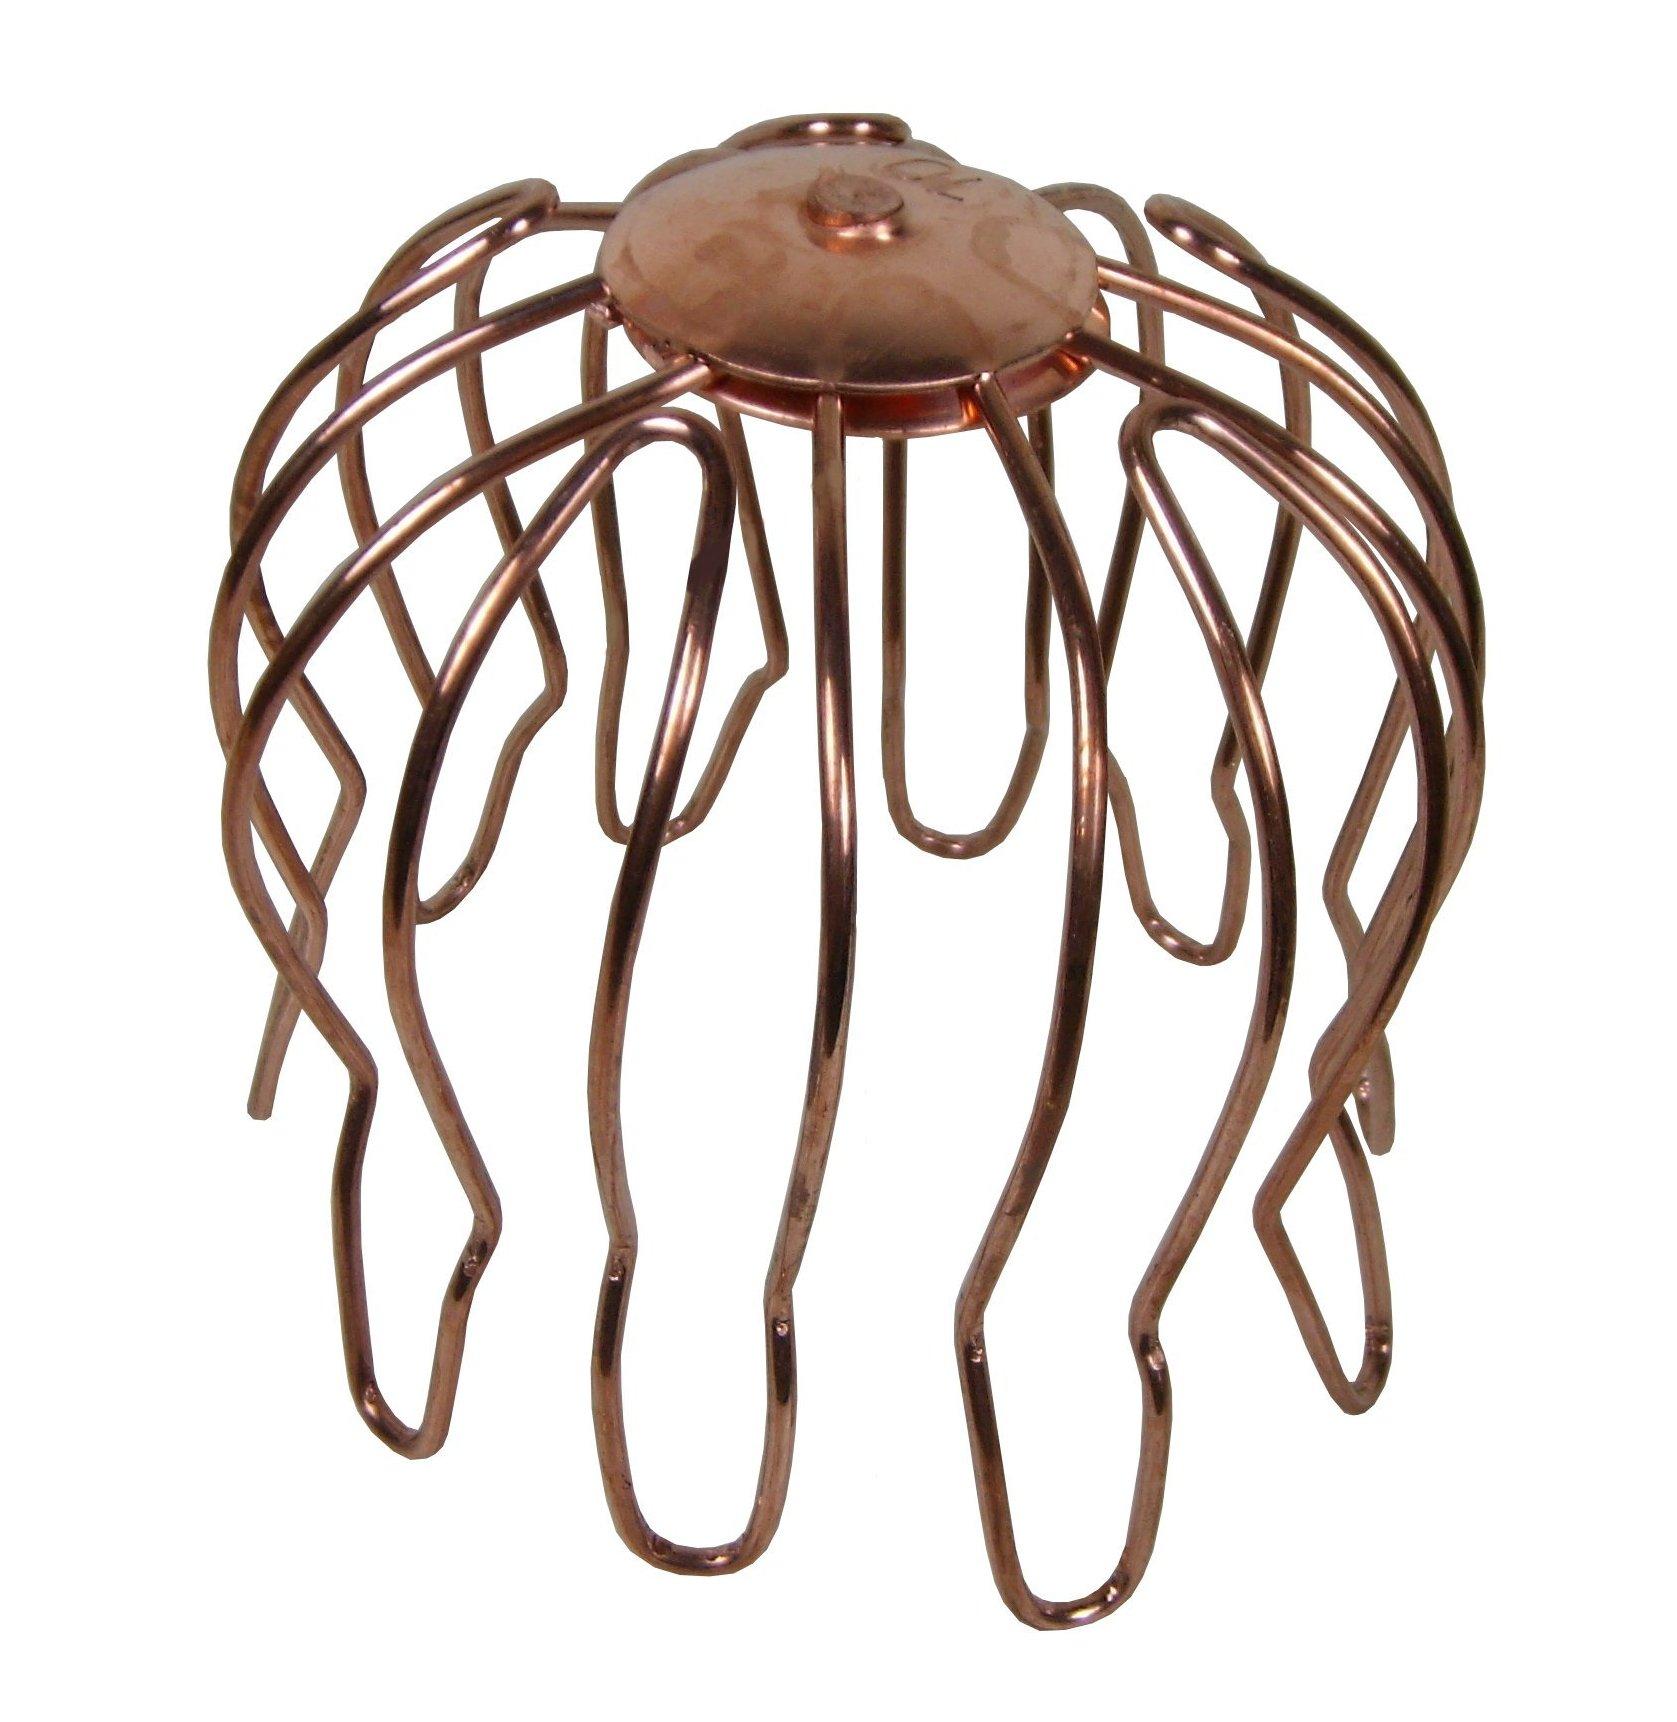 Heavy Duty Wire Strainer - Copper